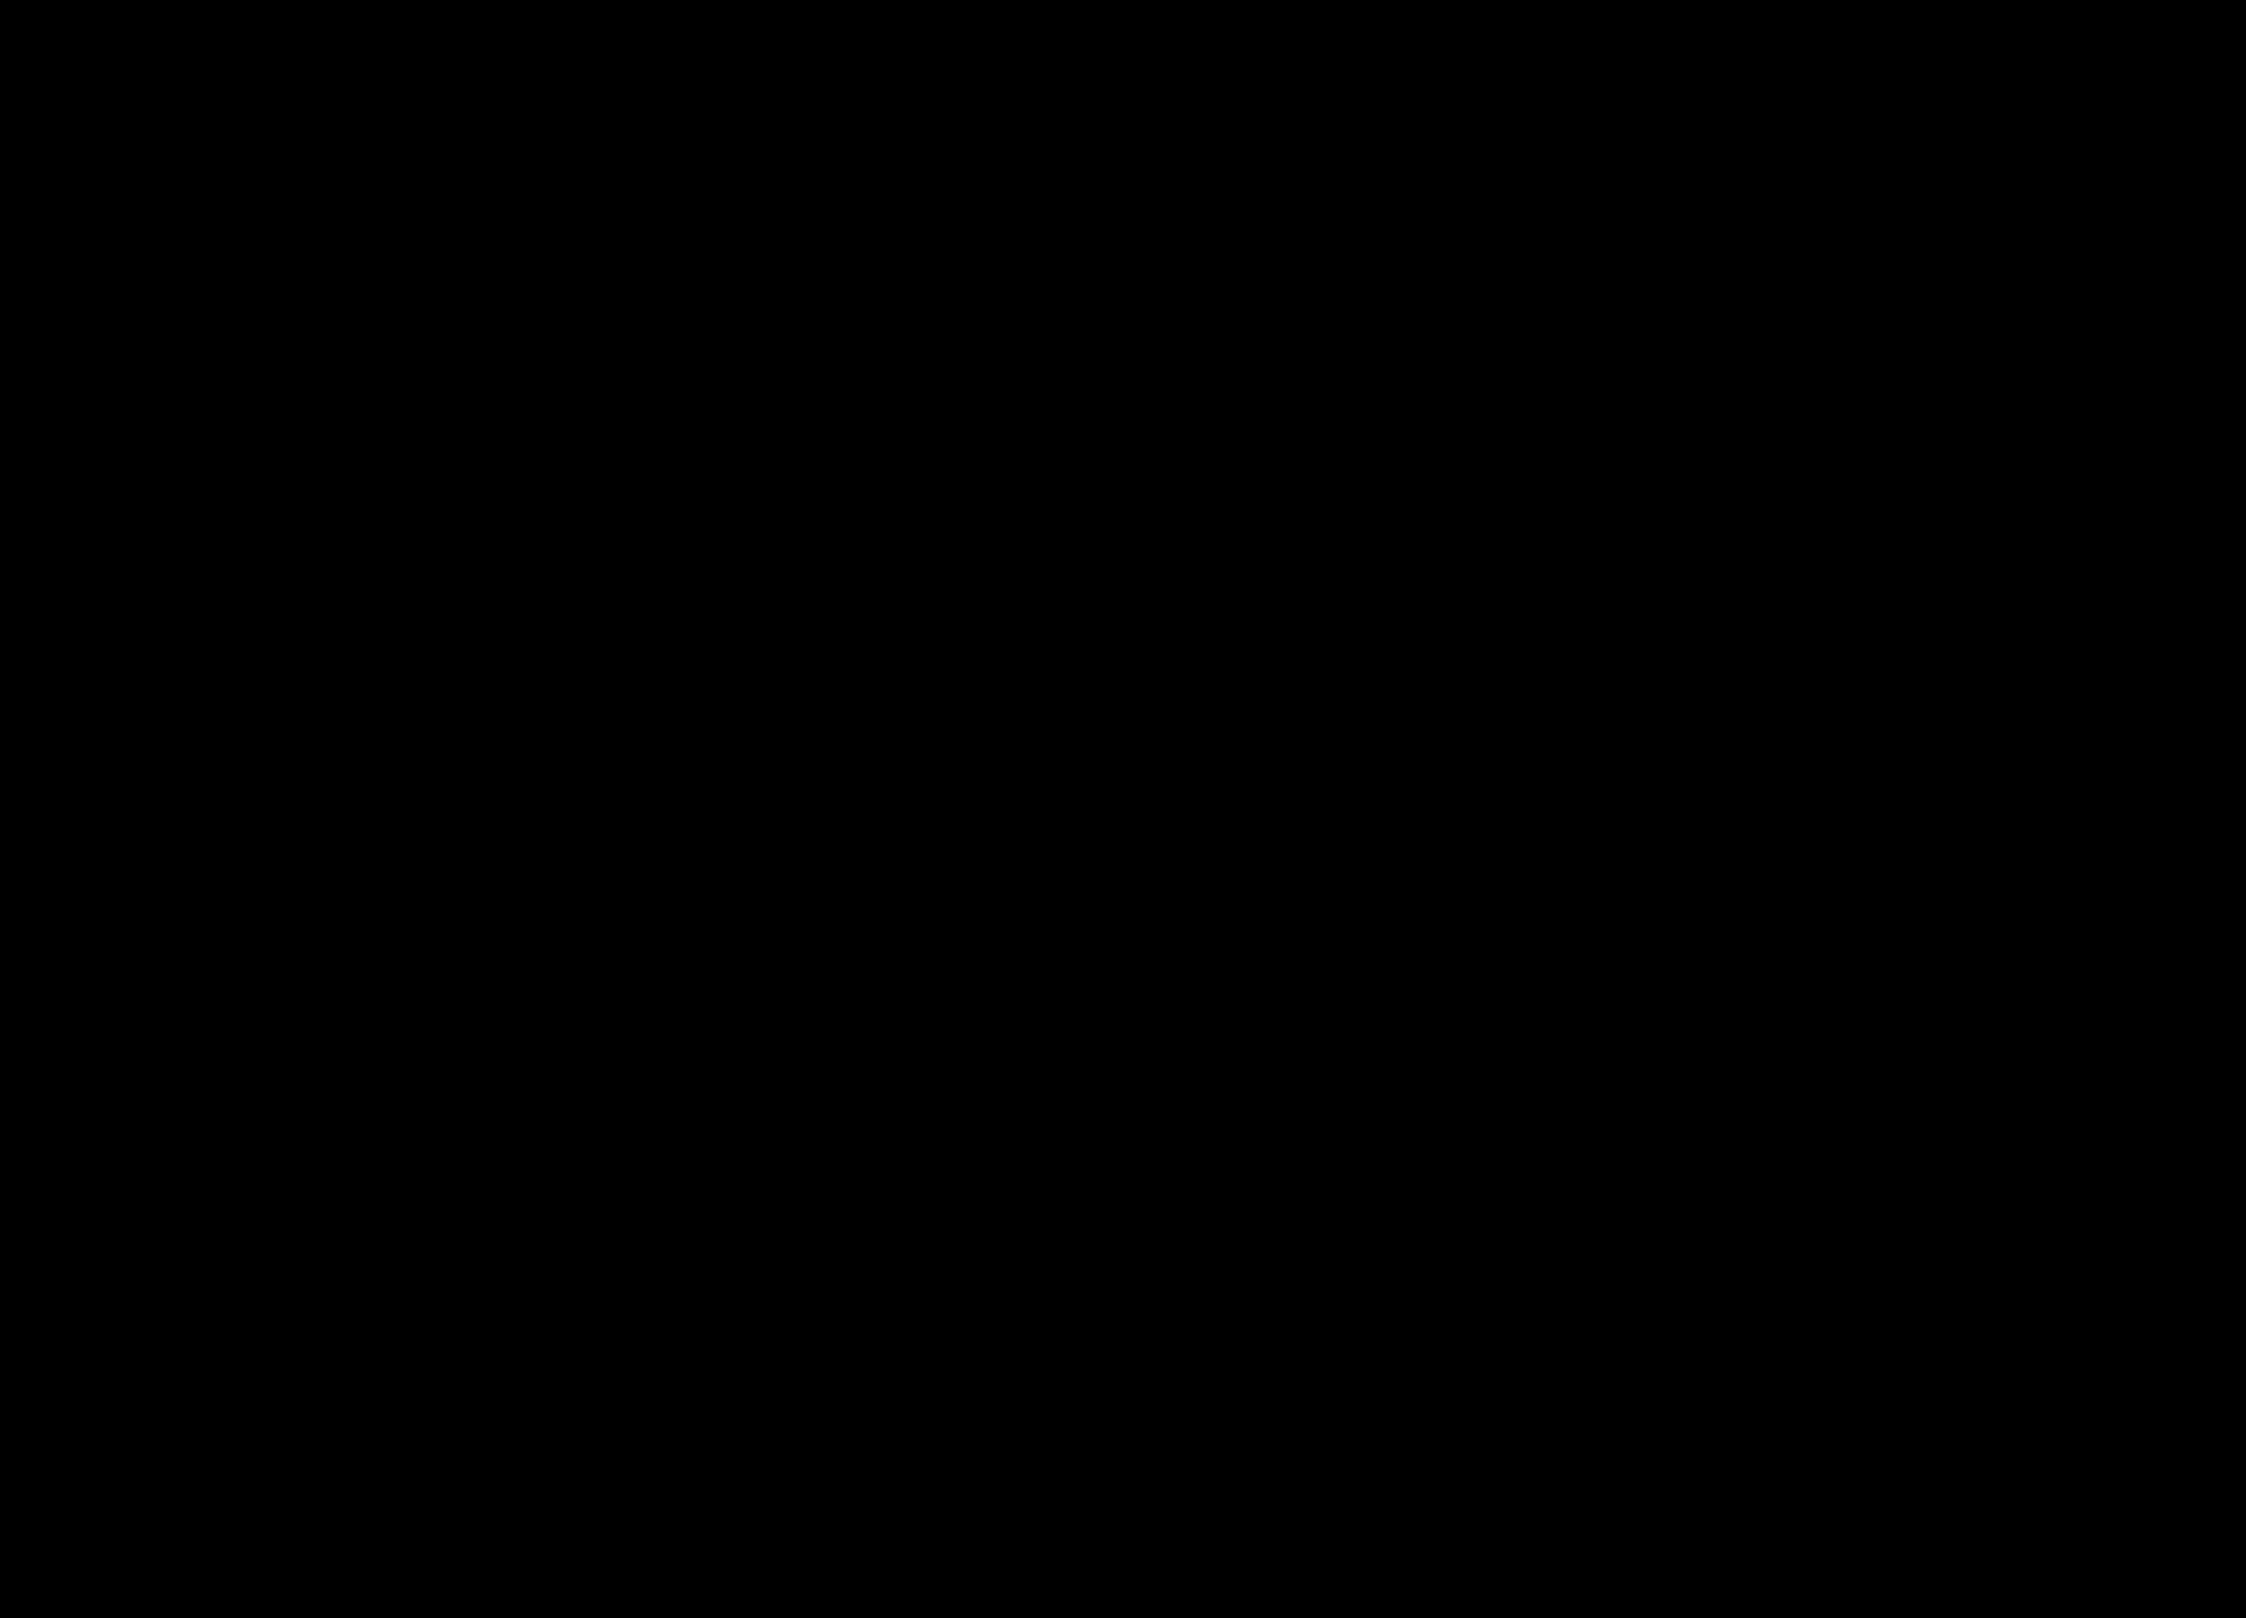 Lantern silhouette